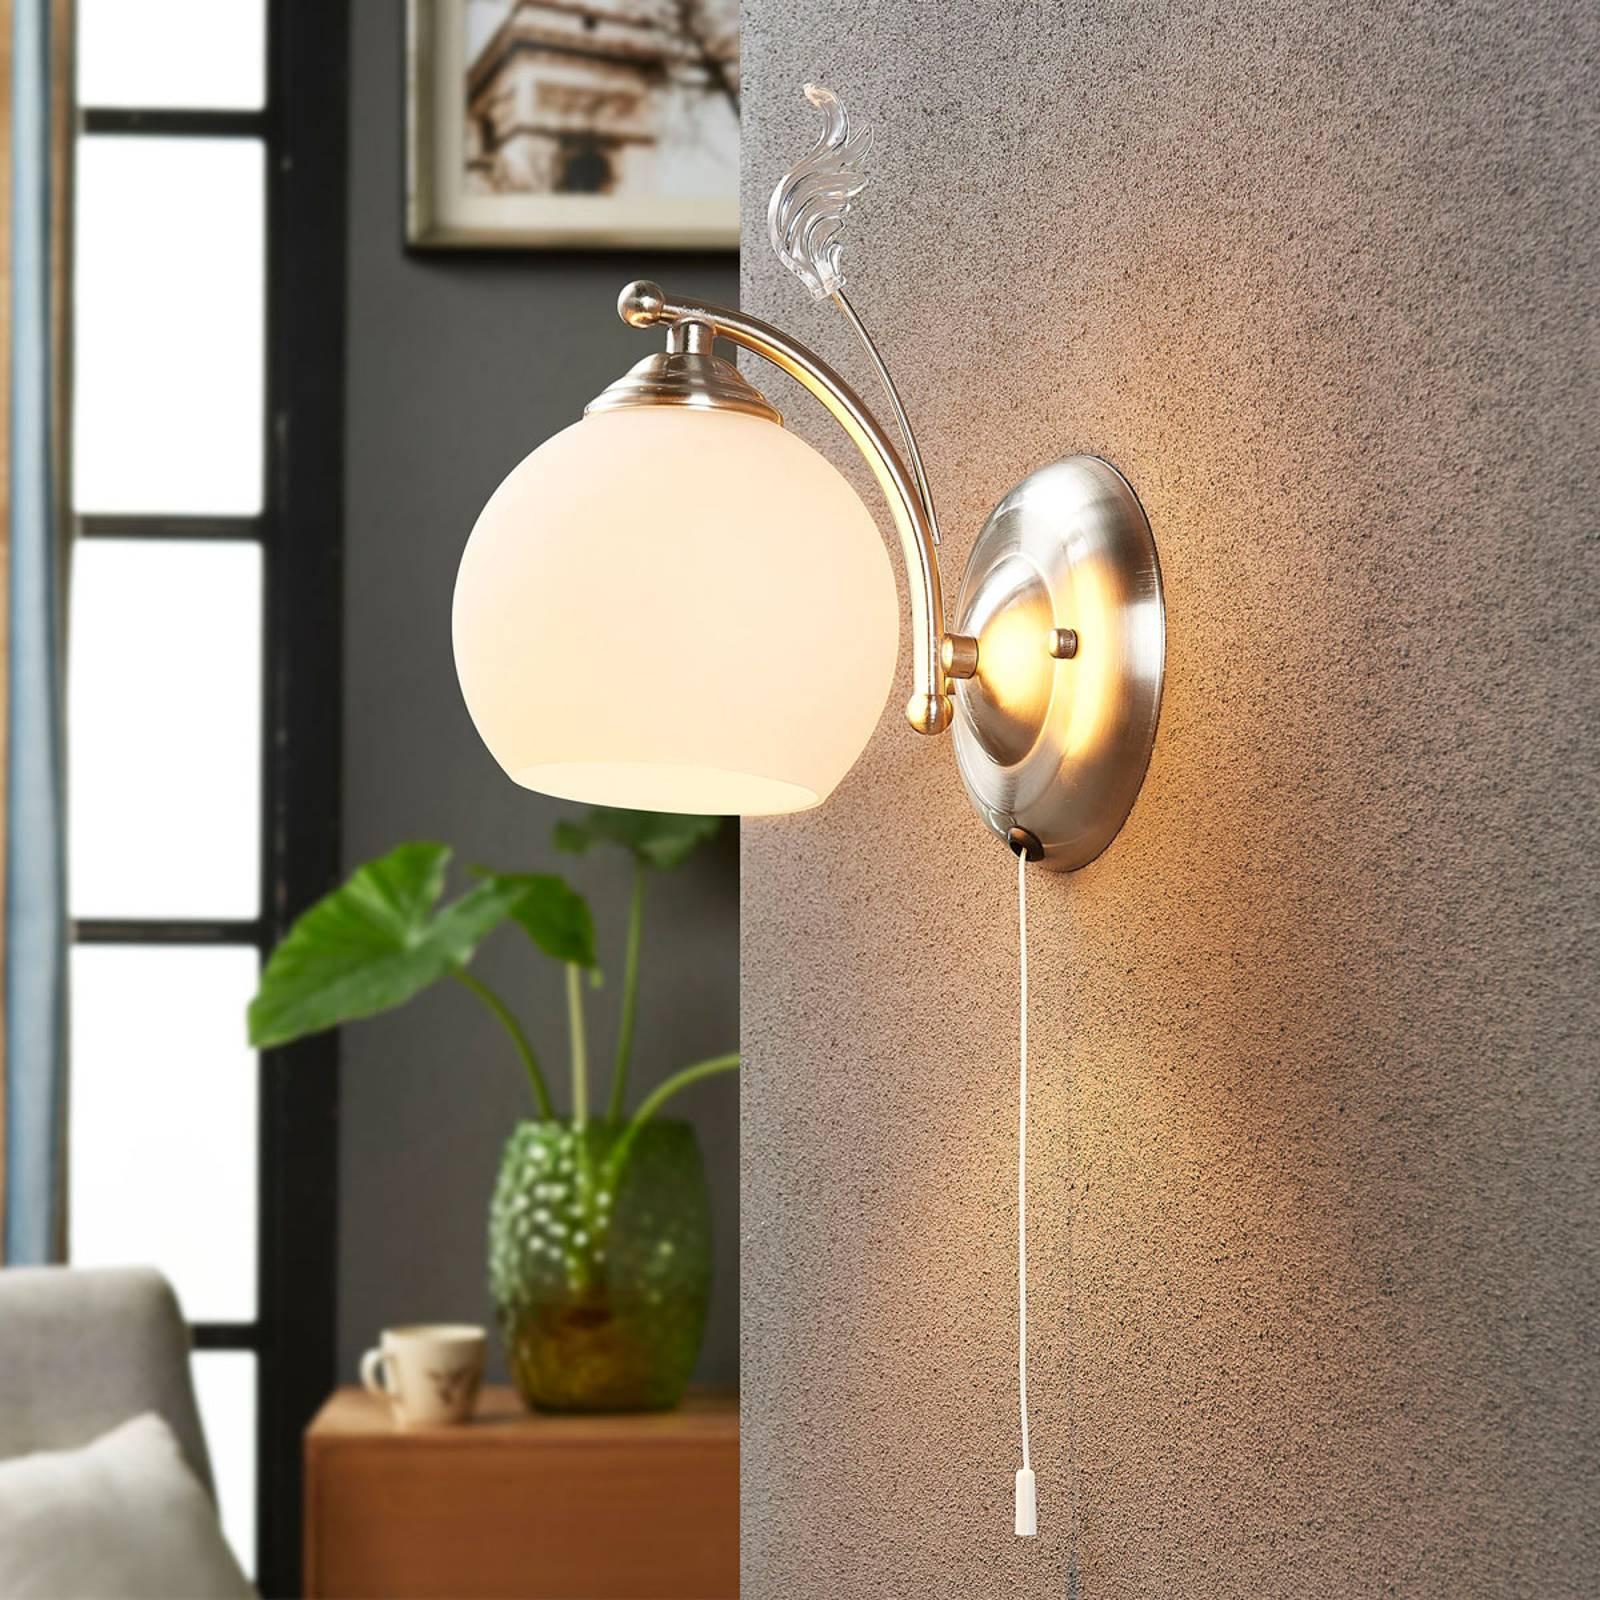 Decoratieve wandlamp Svean